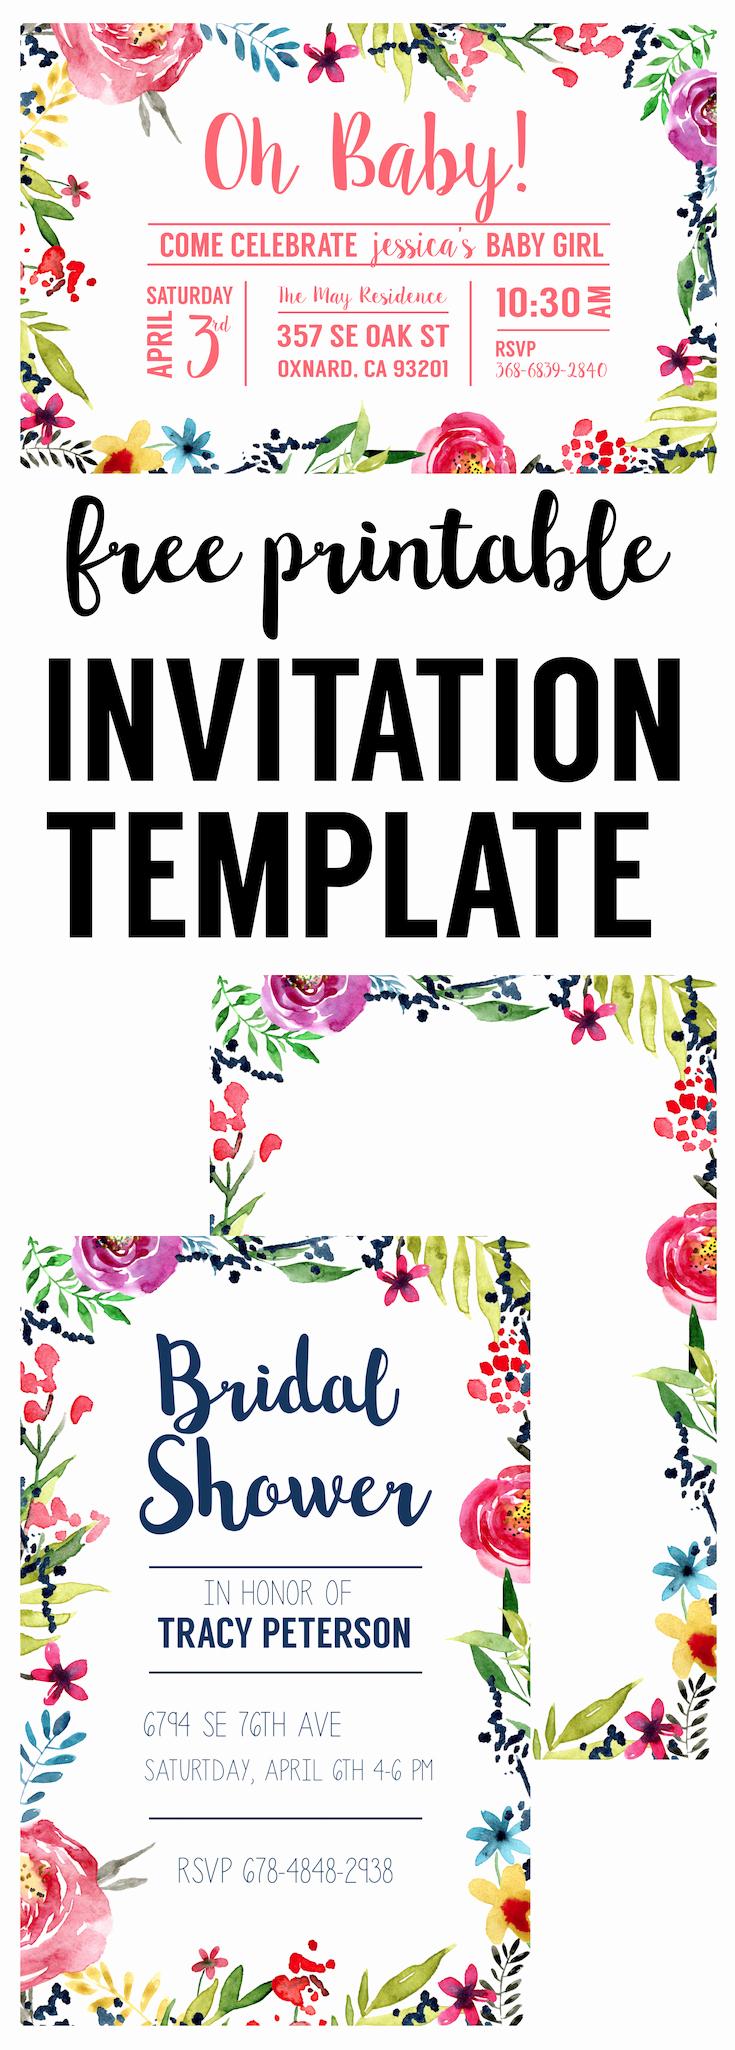 Free Printable Invitation Templates Awesome Floral Borders Invitations Free Printable Invitation